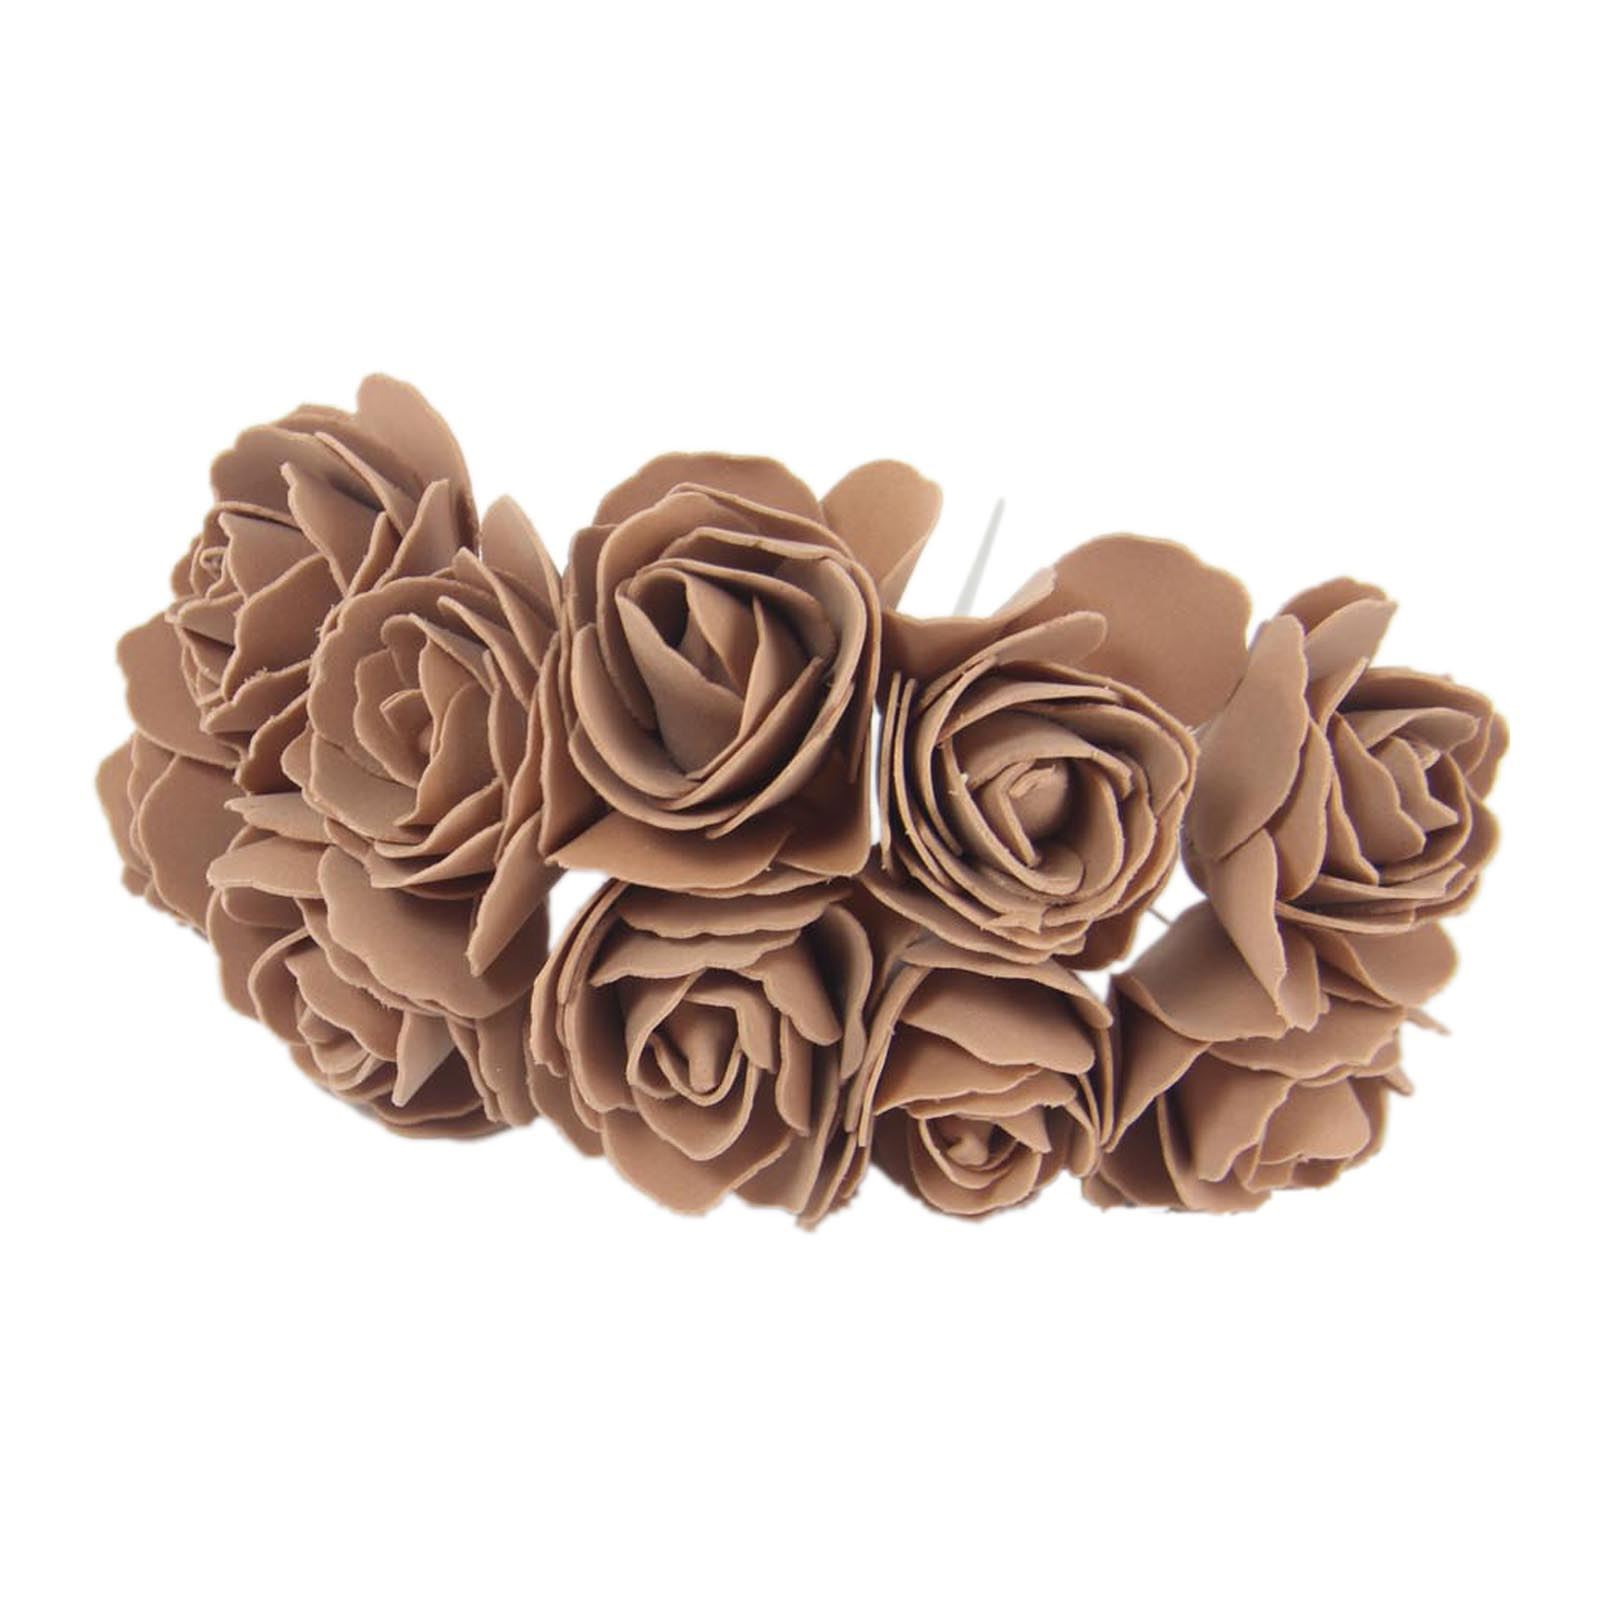 Bunch Of 10 5cm Open Foam Roses Fake Artificial Silk Flowers